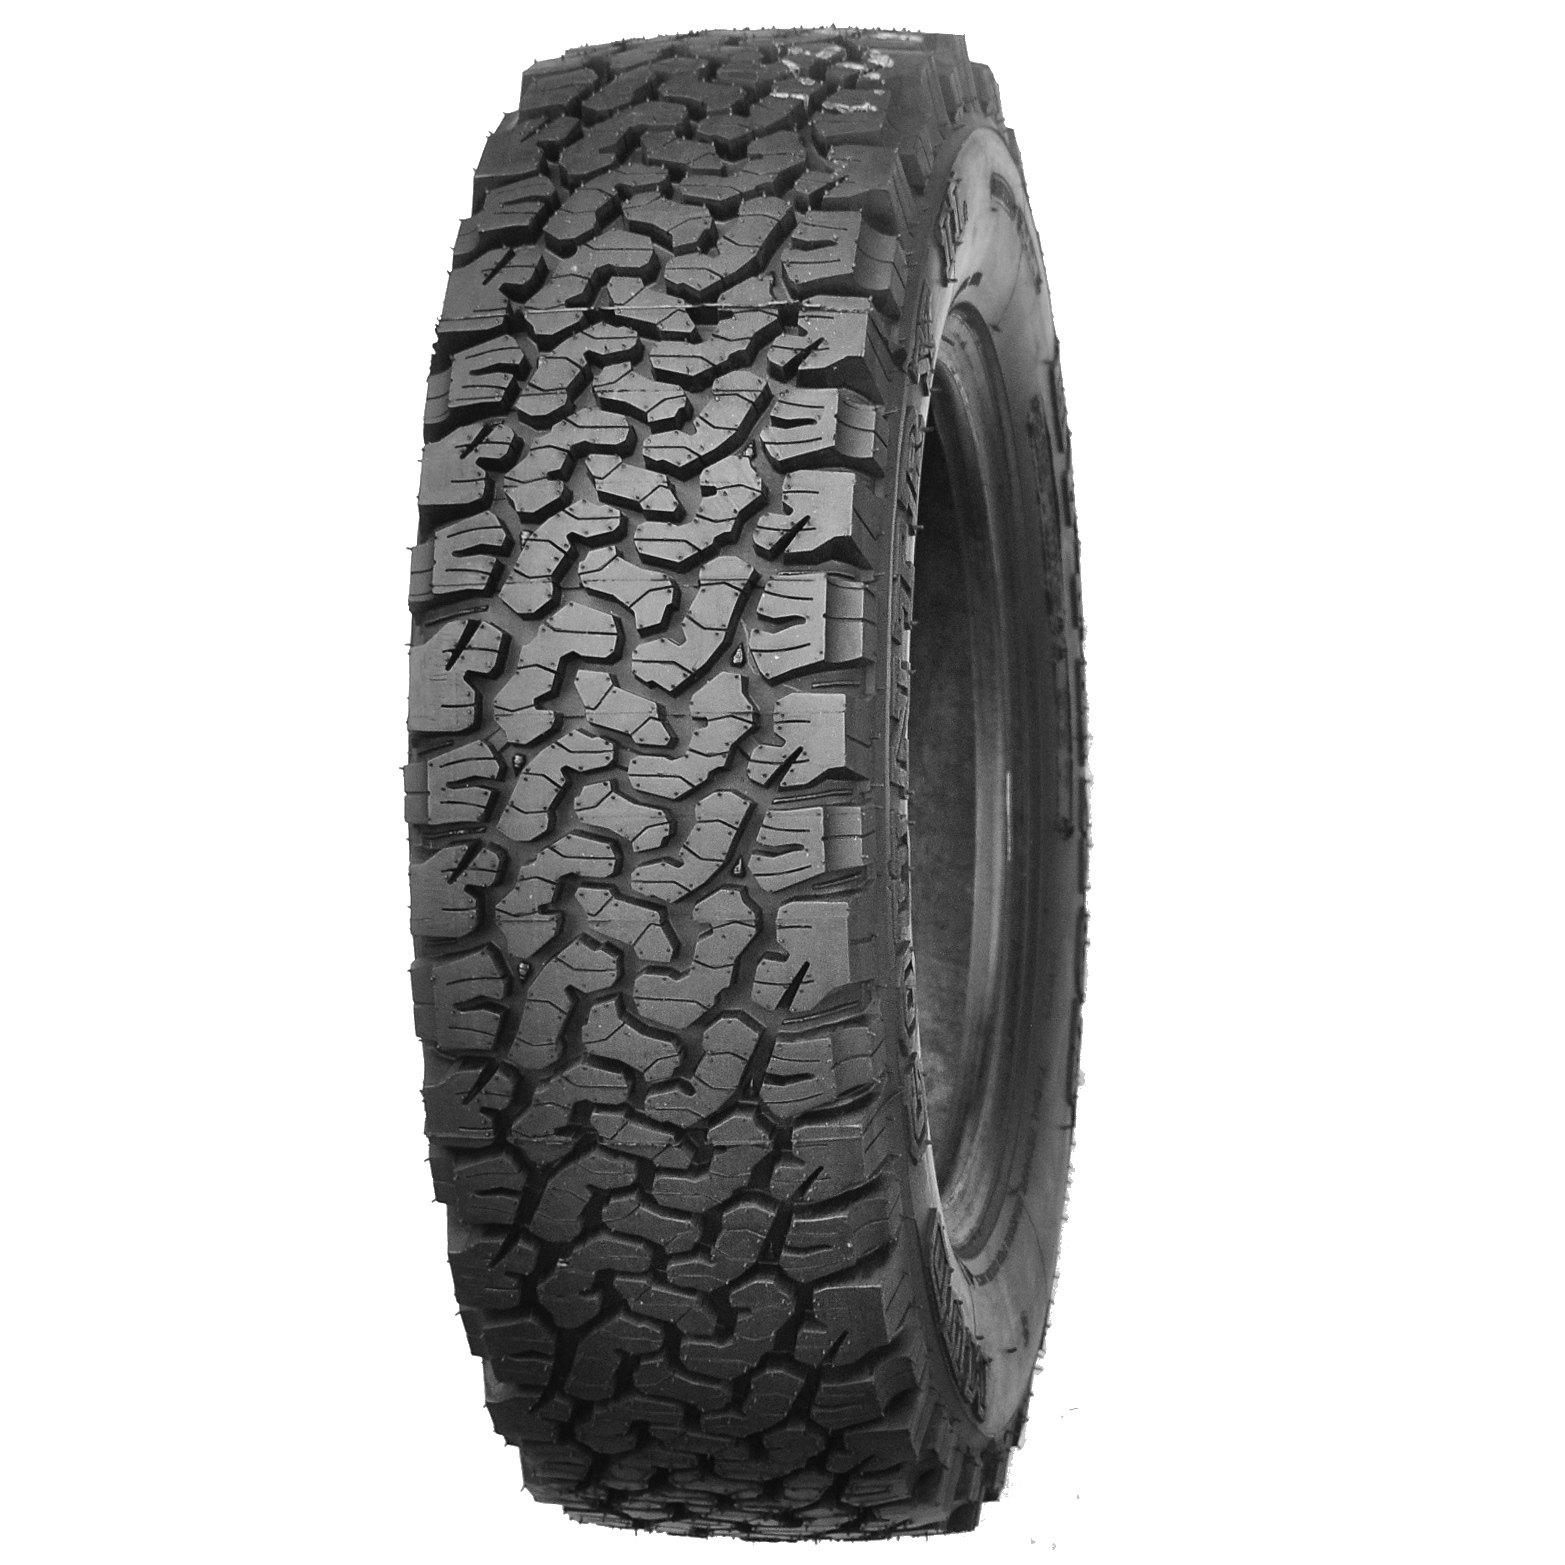 Off Road Tires For Trucks >> Pneus Ovada 4x4 Tires Bfg Ko2 205 70 R15